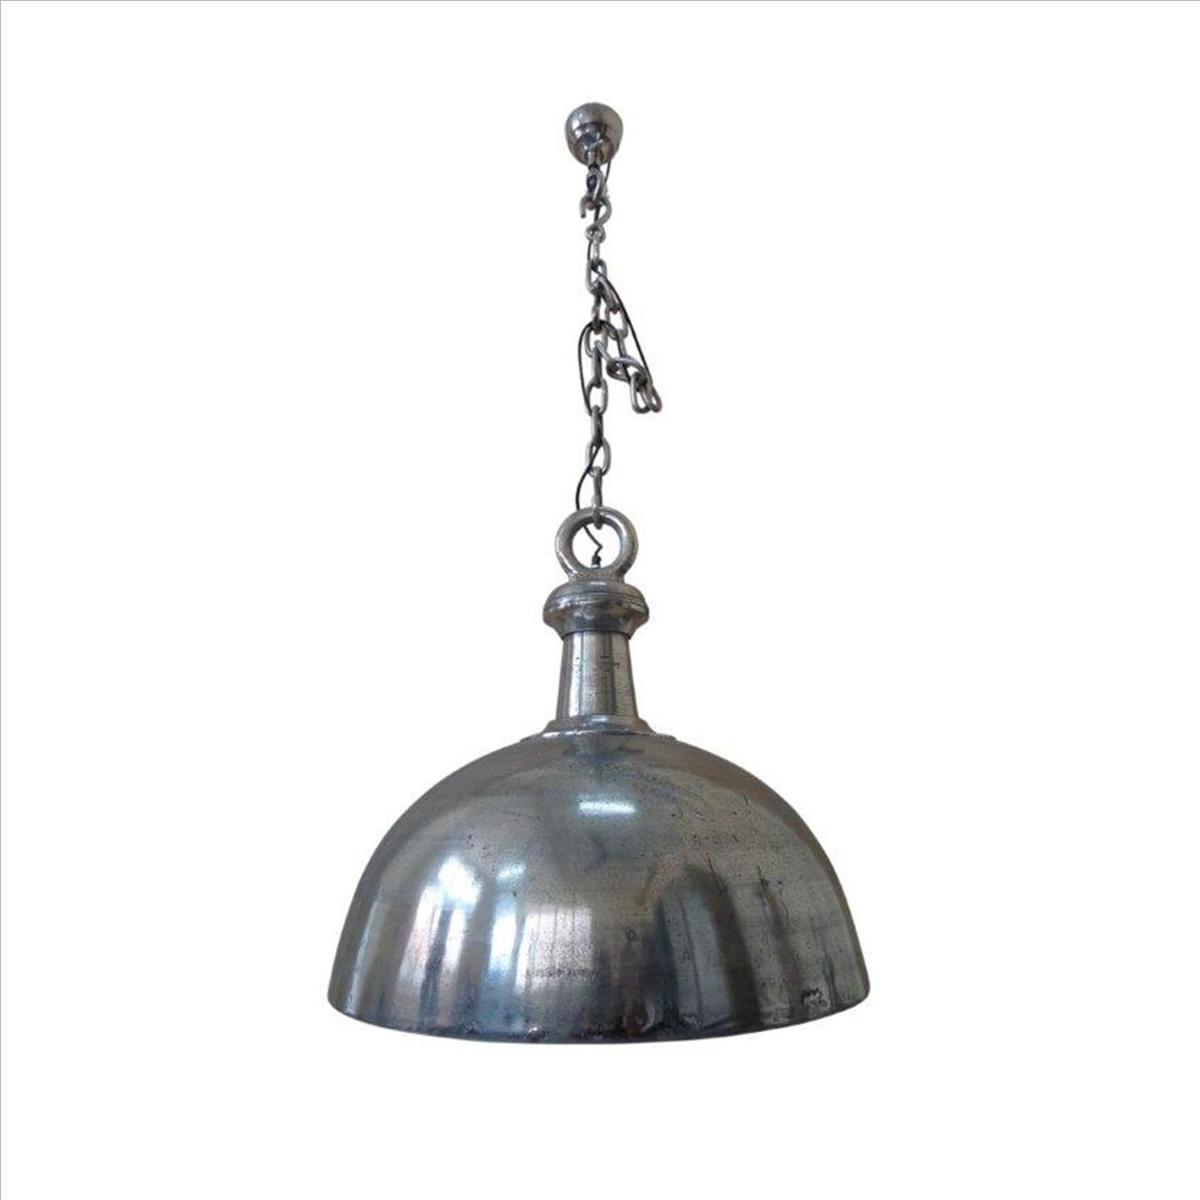 Deco4yourhome - Hanglamp - 69cm - Shiny Nickel